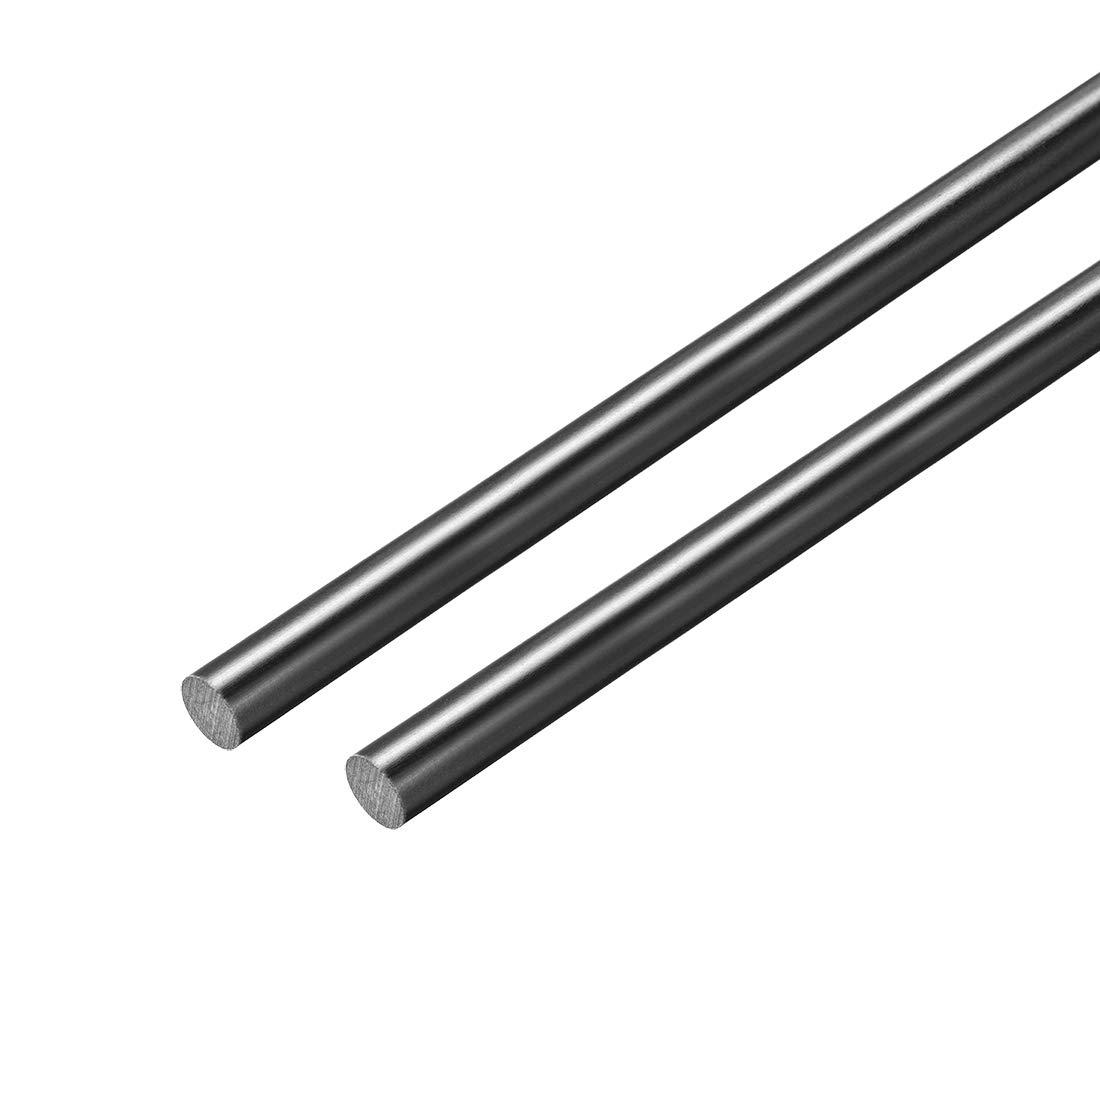 1.5mm Dia 20 Length Black Engineering Round Bar Rod 2pcs sourcing map FRP Fiberglass Round Rod